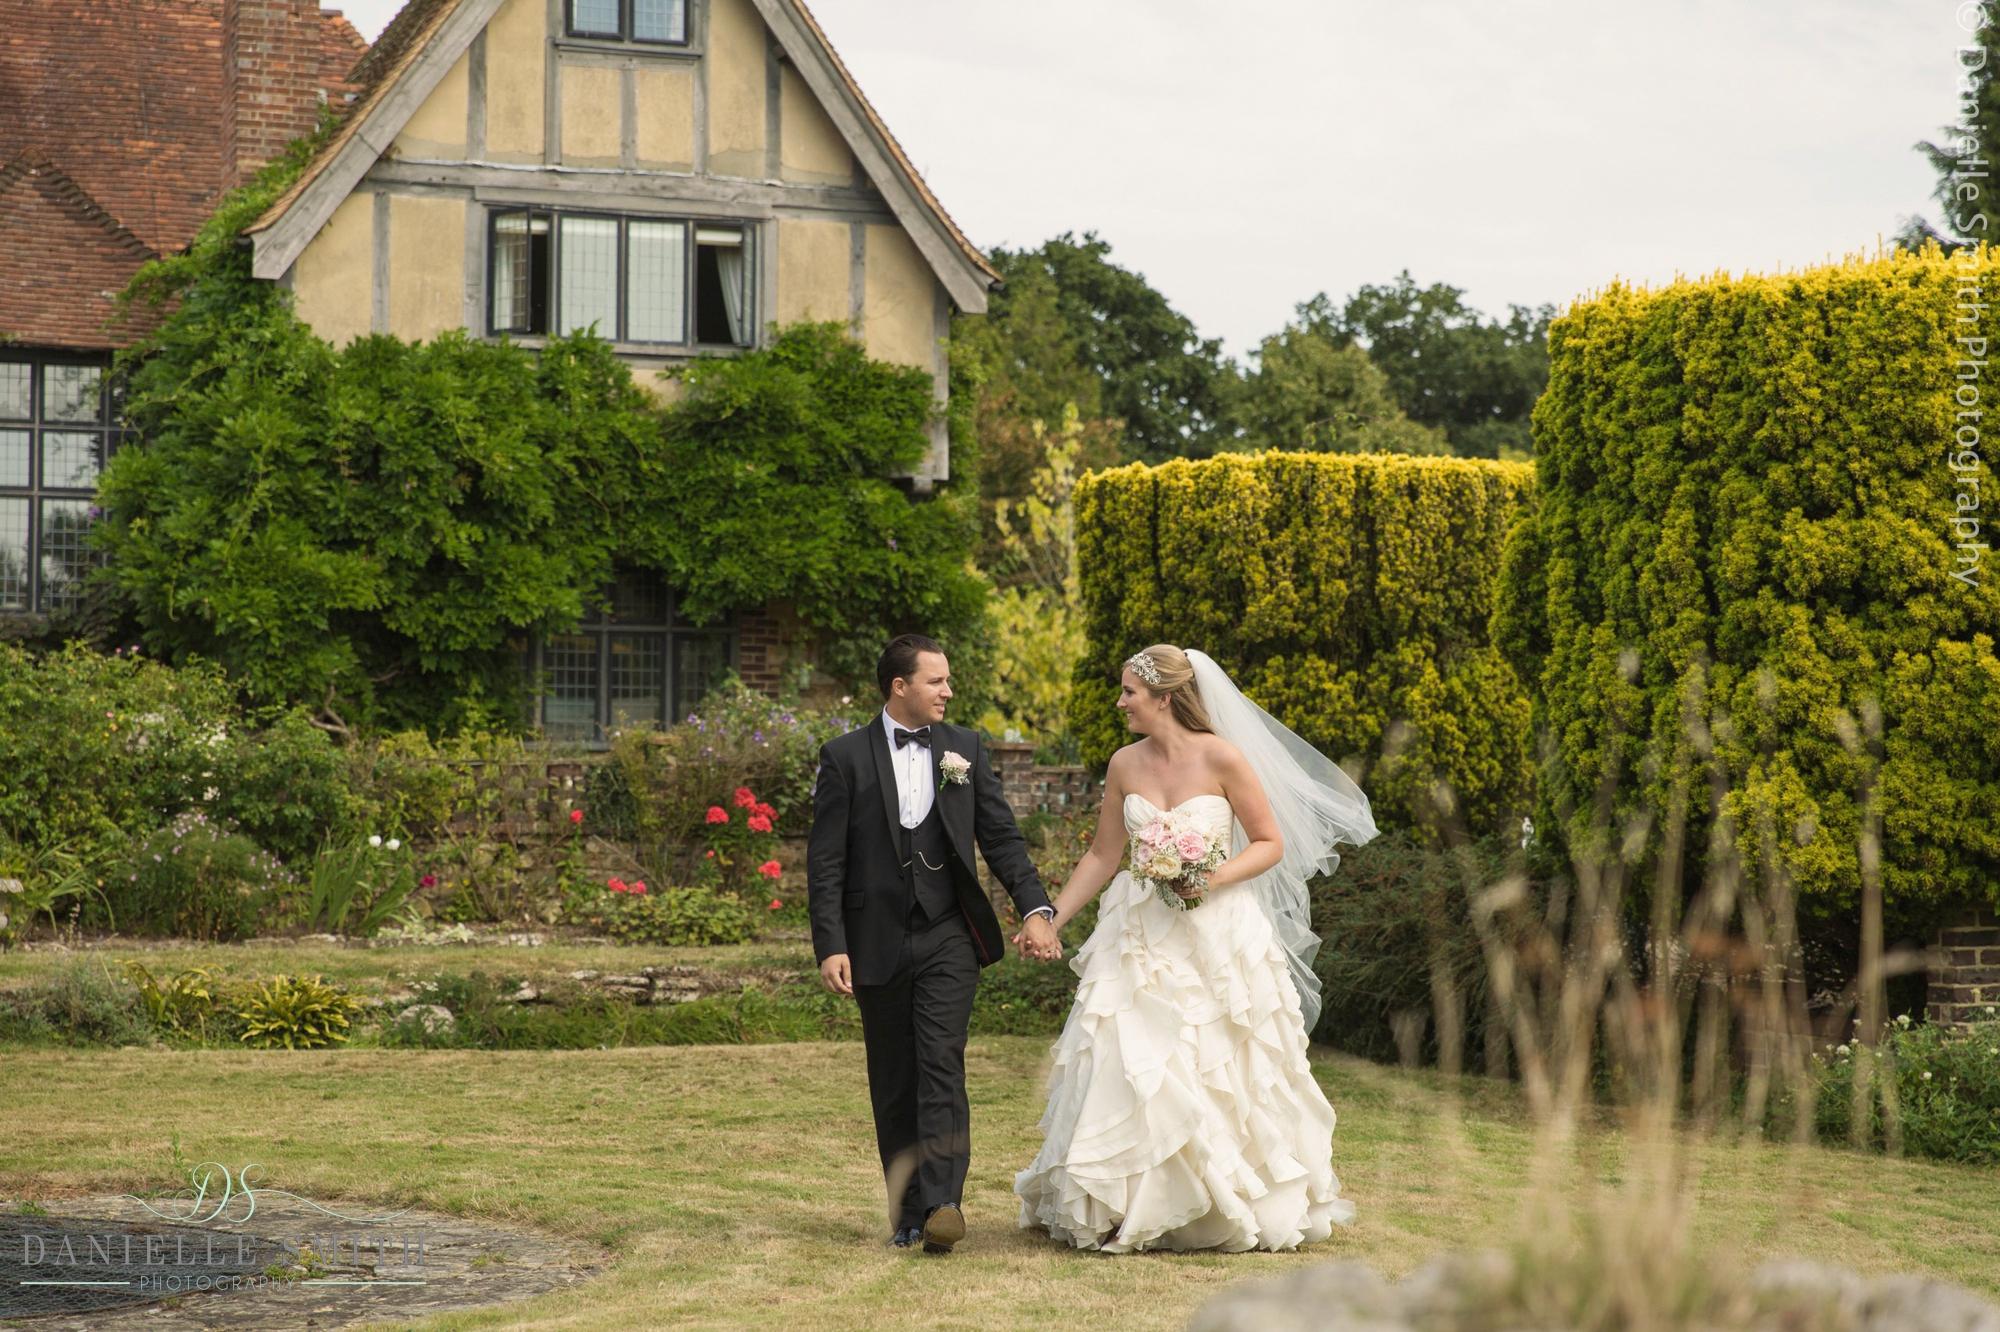 bride and groom walking through gardens - summer garden wedding